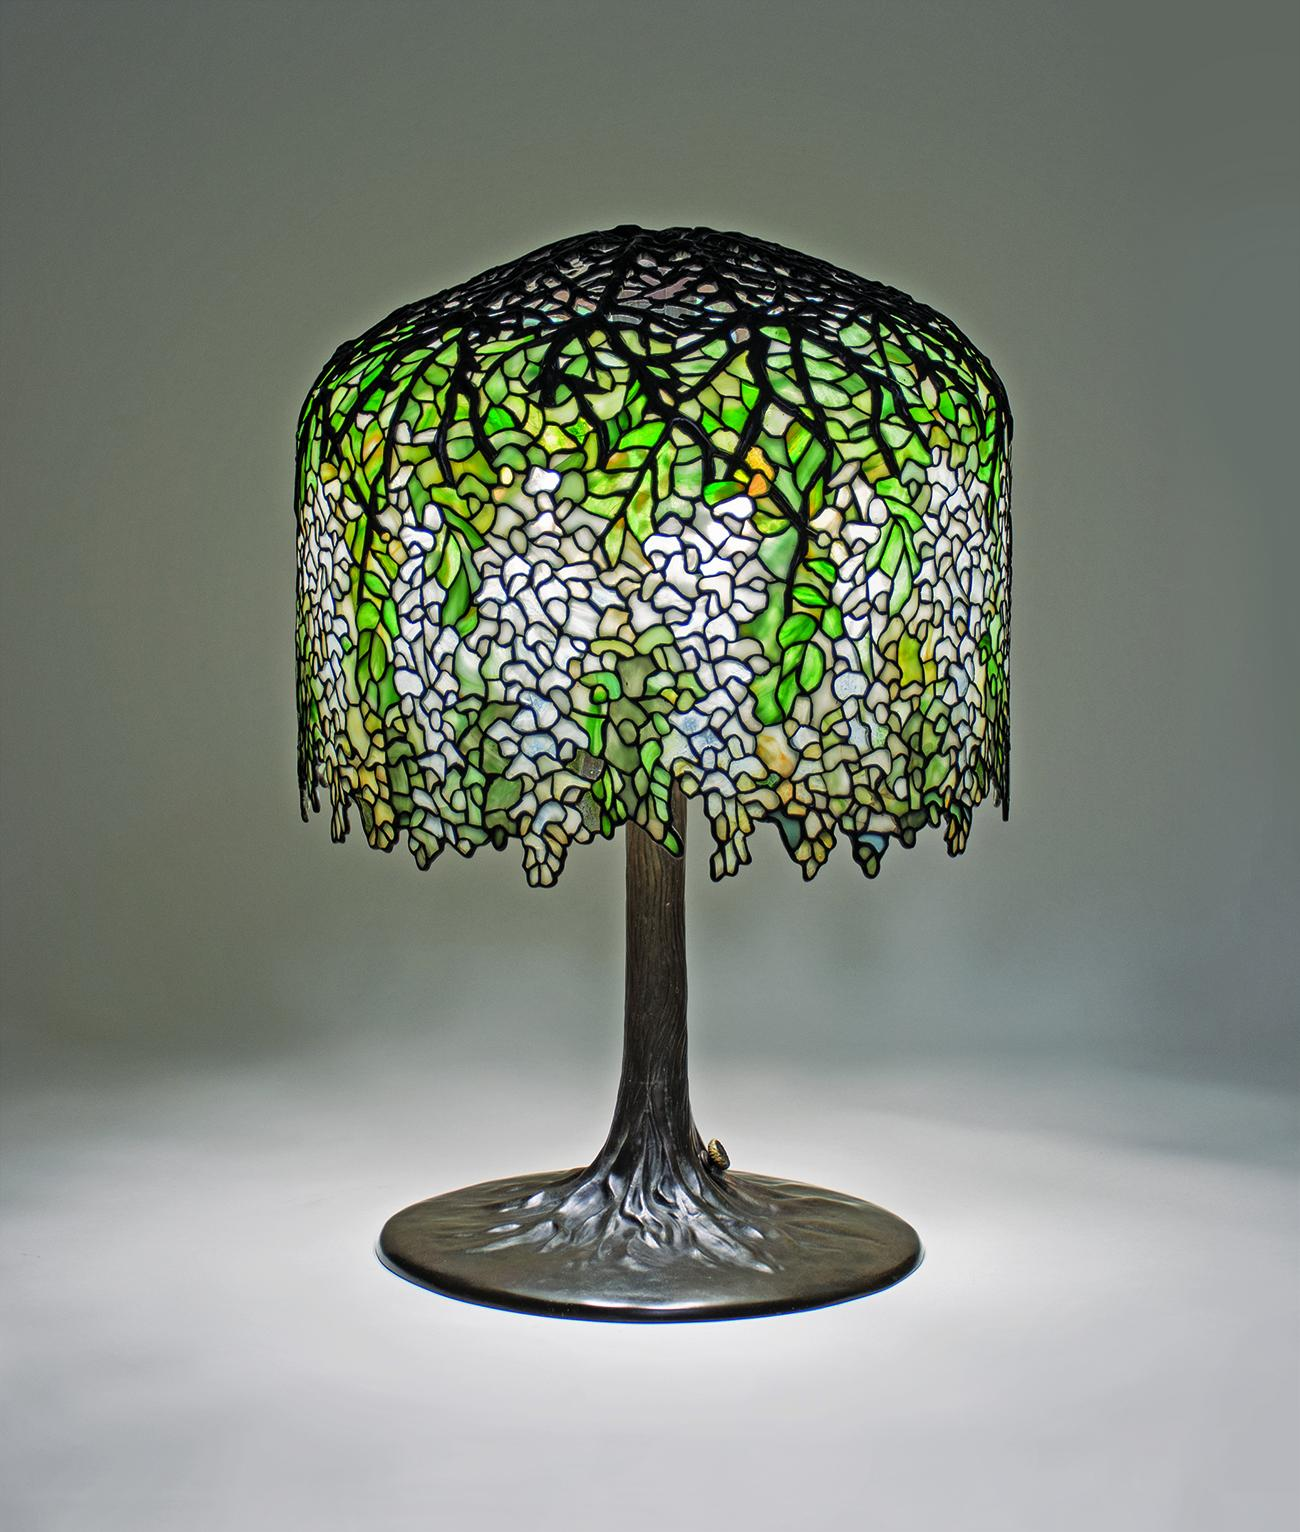 Tiffany Studios  White Wisteria  Table Lamp 1